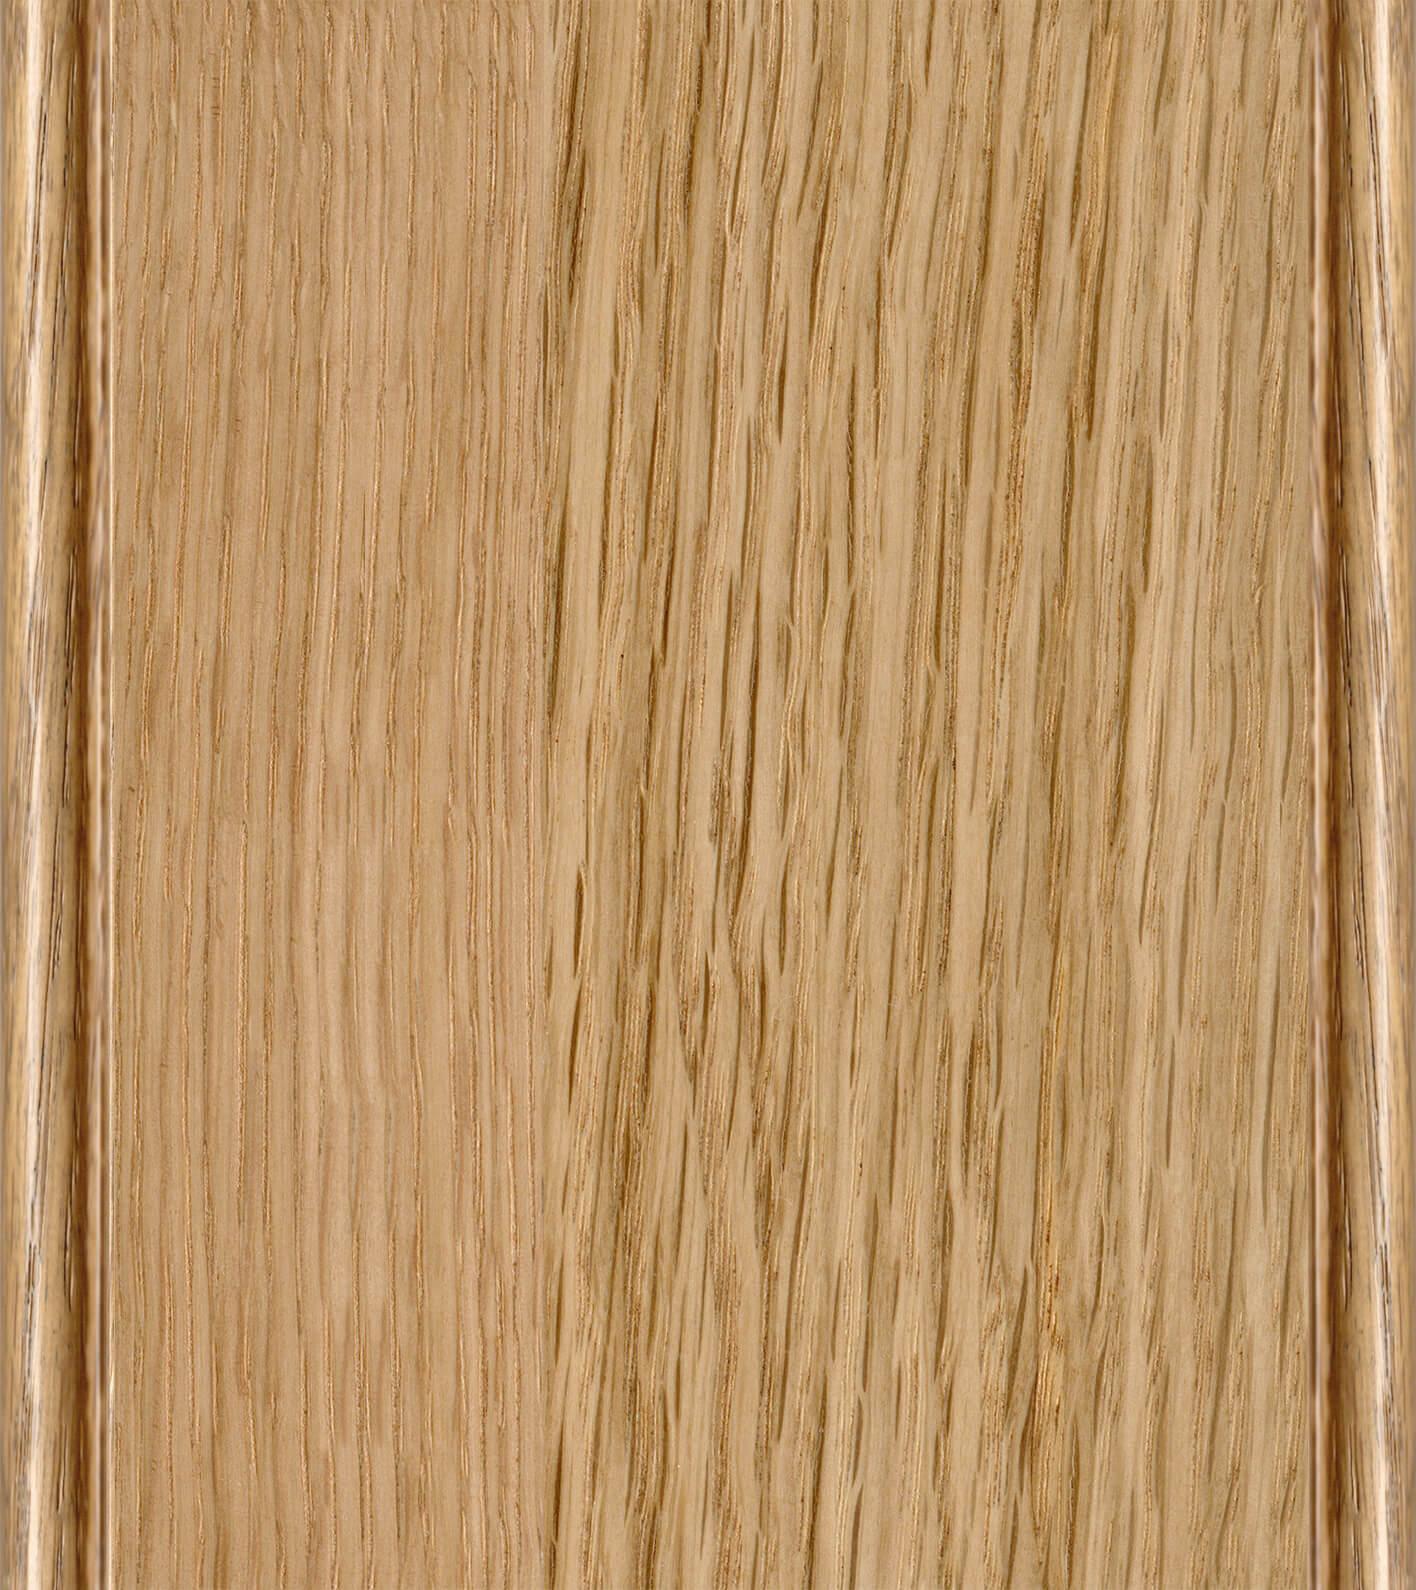 Natural Stain on Quarter-Sawn White Oak